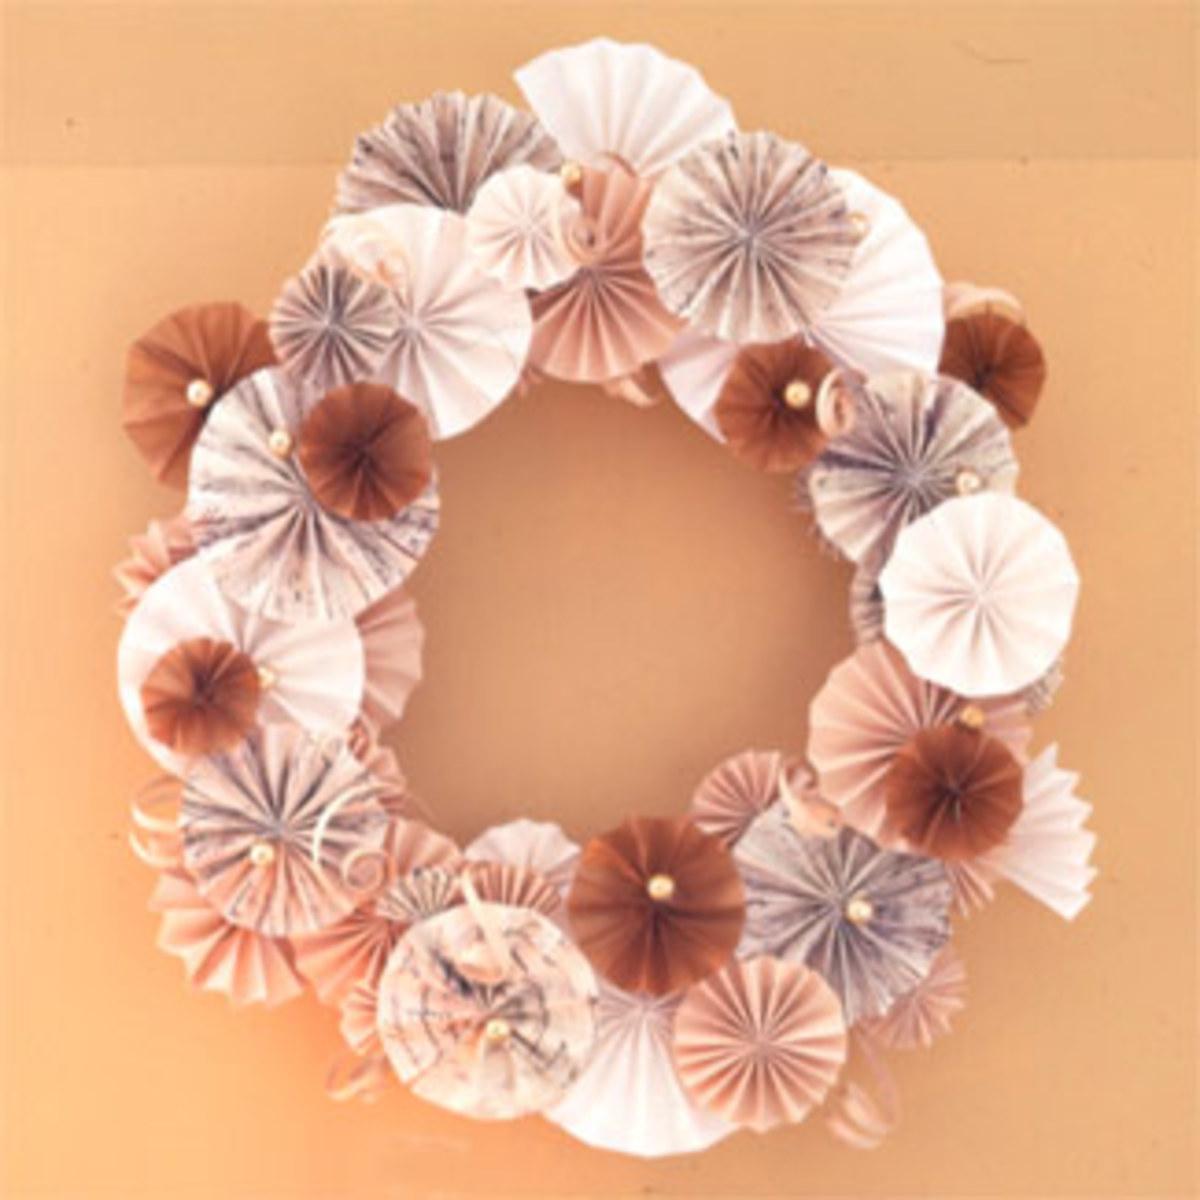 Tissue Paper Christmas Wreath goodhousekeeping.com